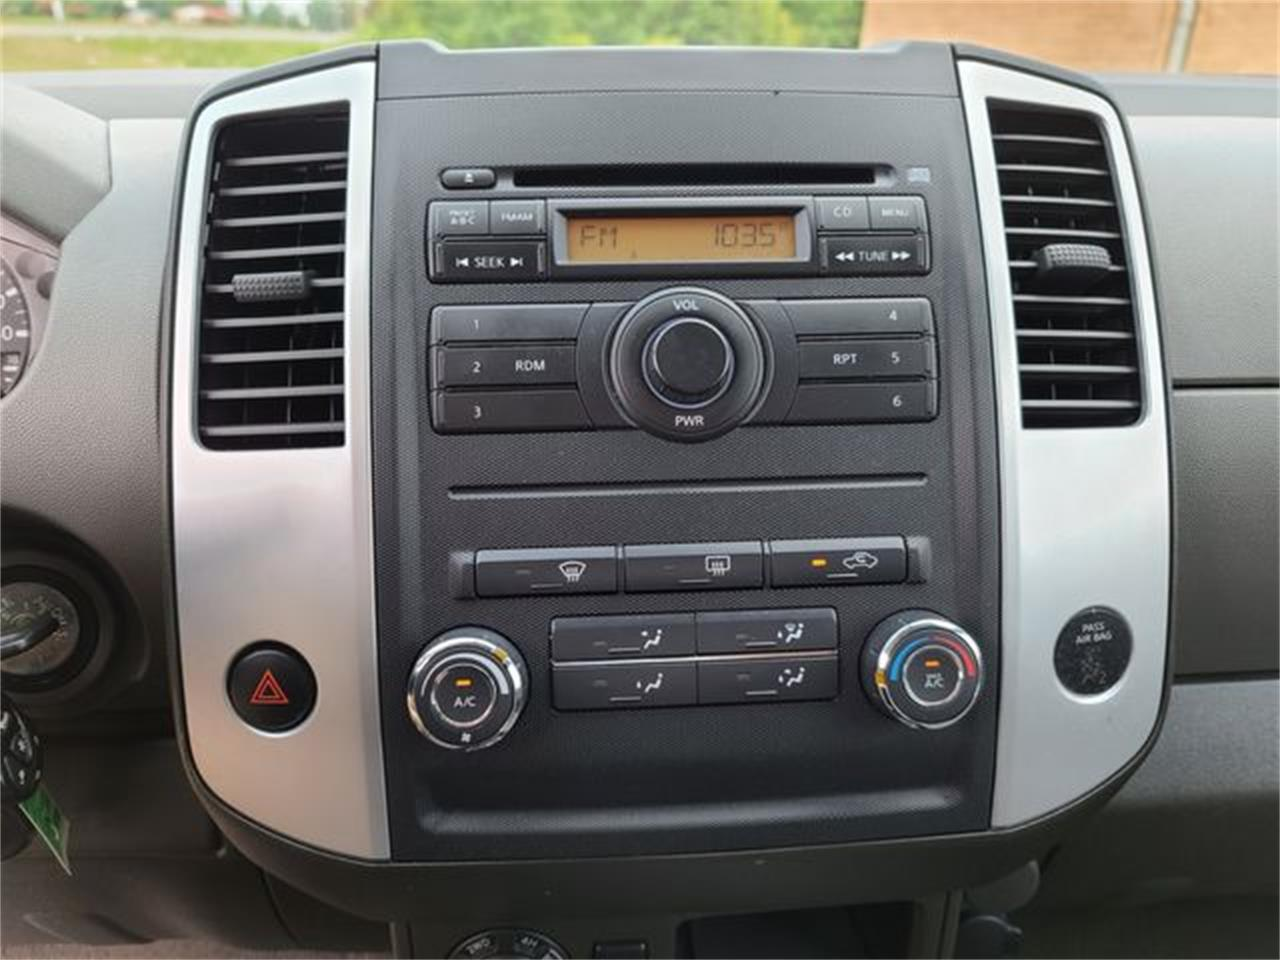 2011 Nissan Xterra (CC-1359922) for sale in Hope Mills, North Carolina